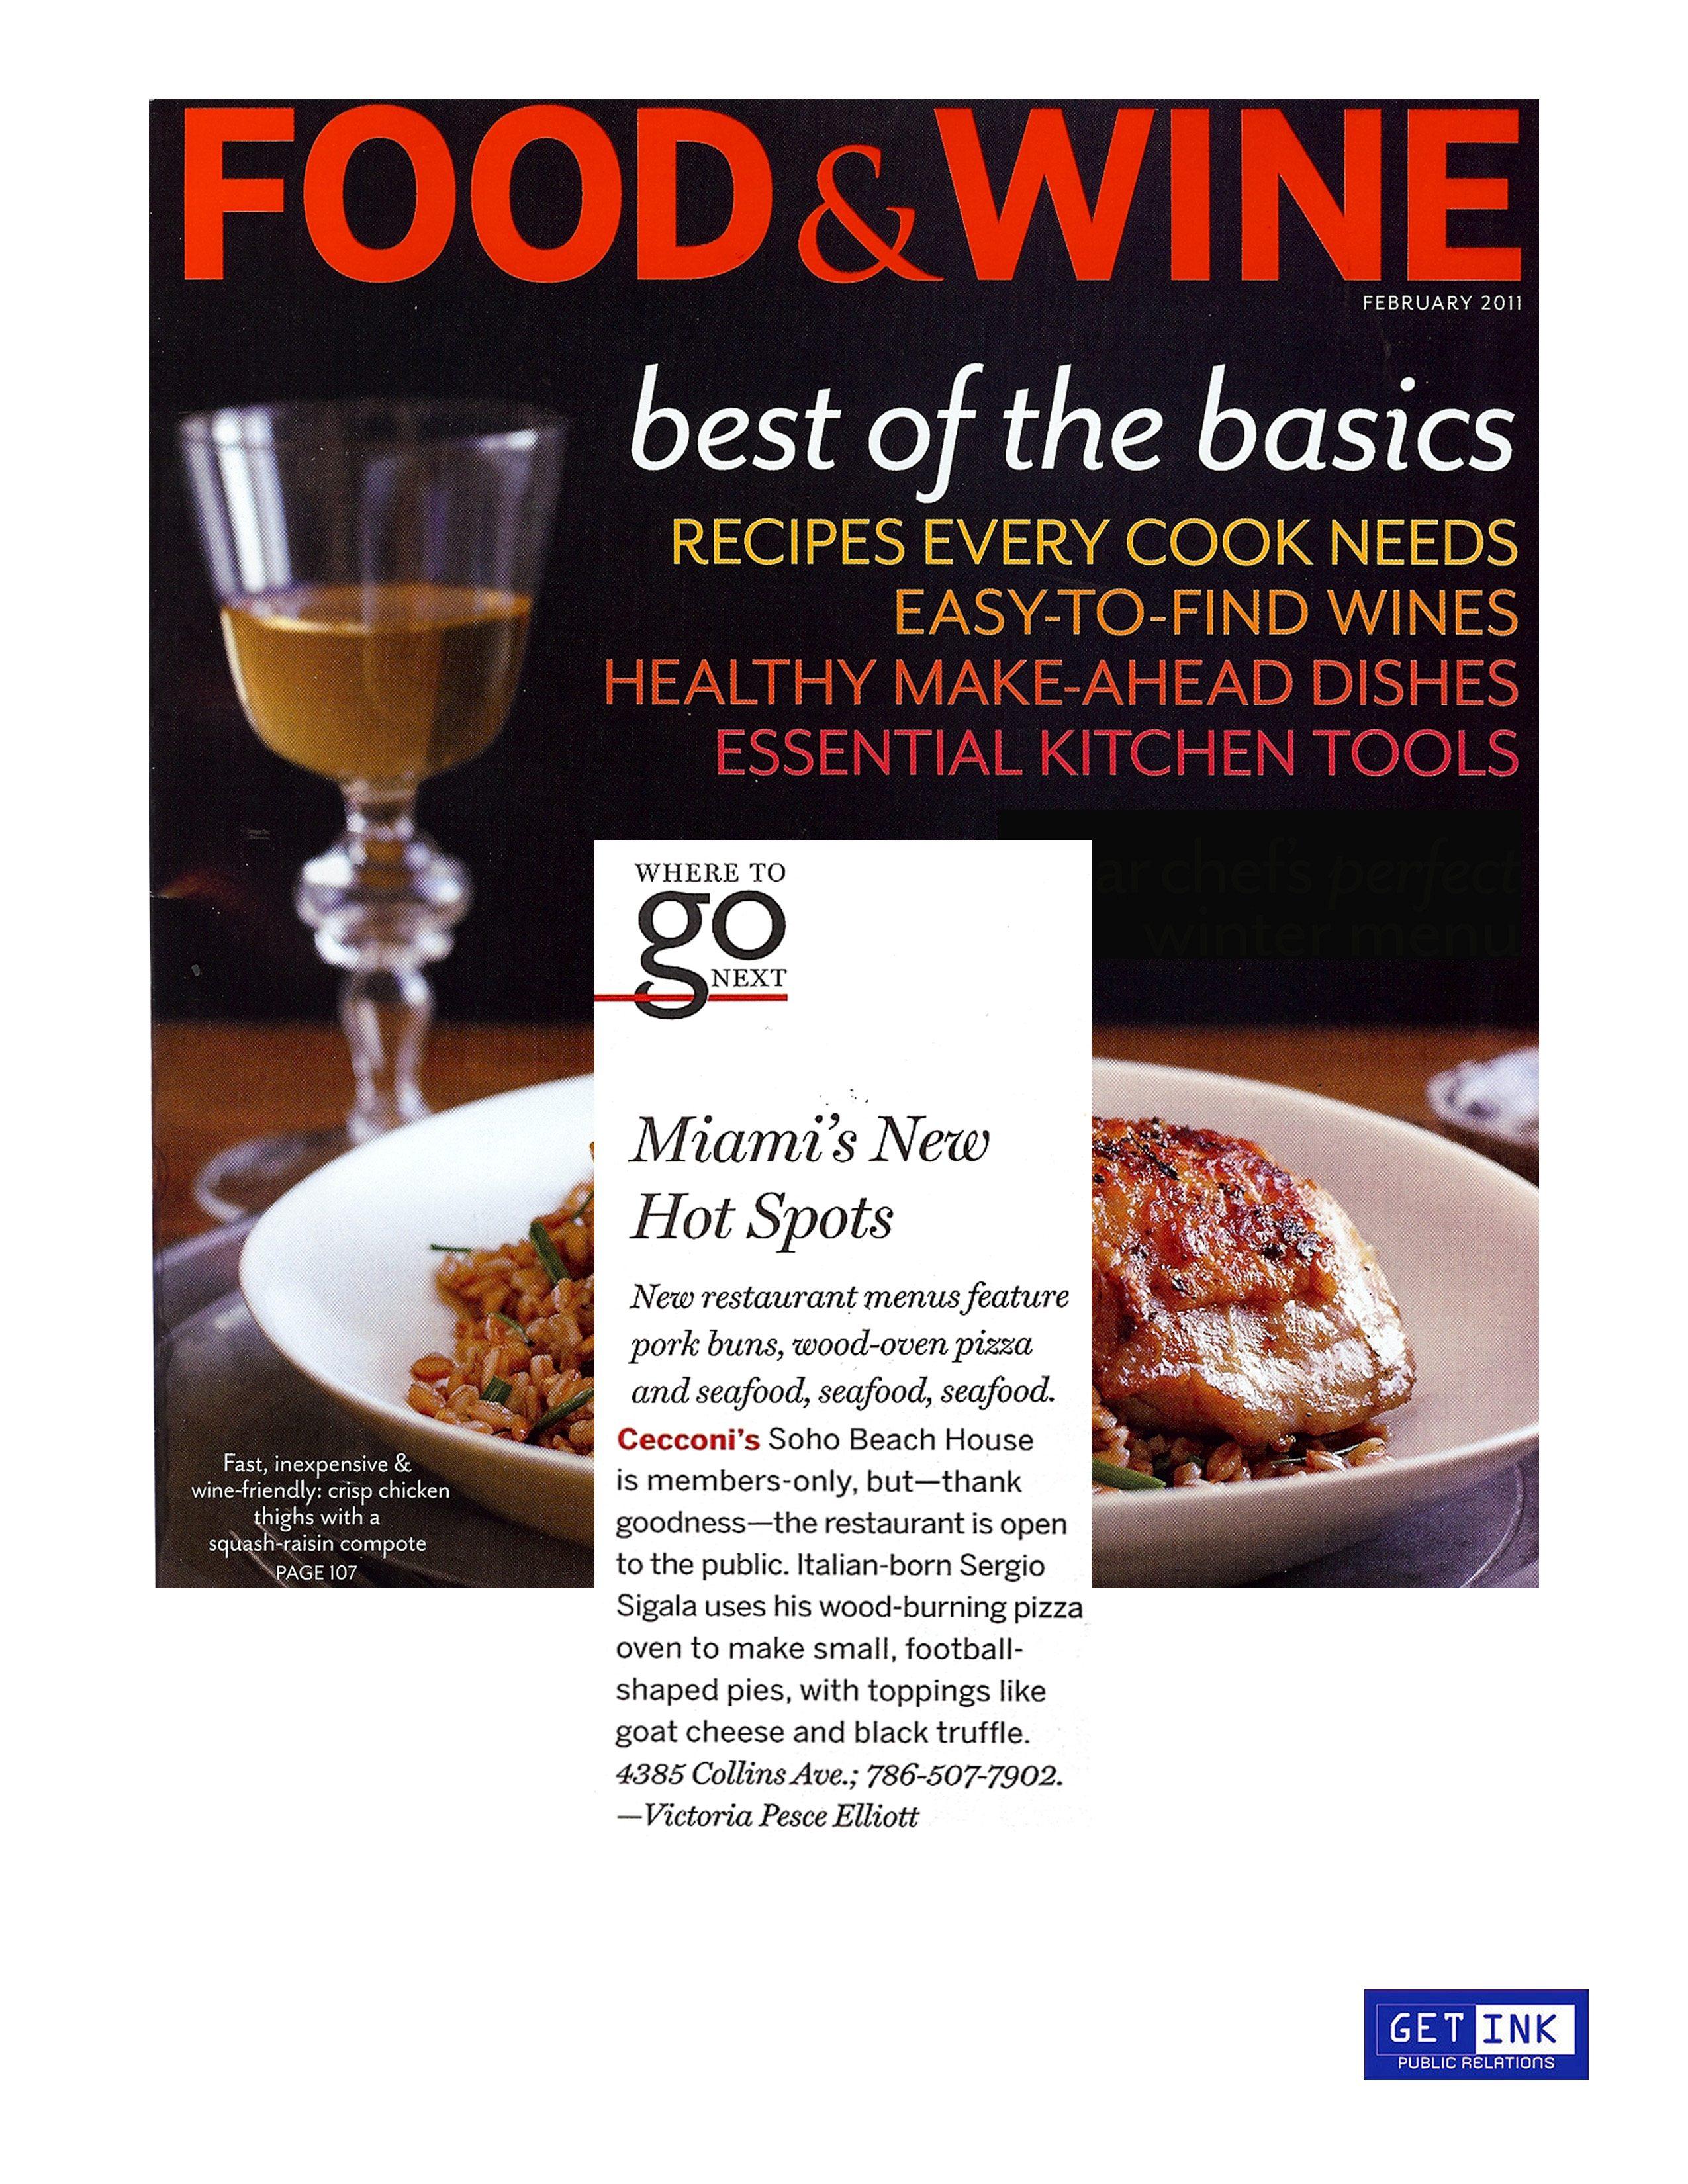 Cecconi's Miami Soho Beach House Food & Wine Magazine - Get Ink PR